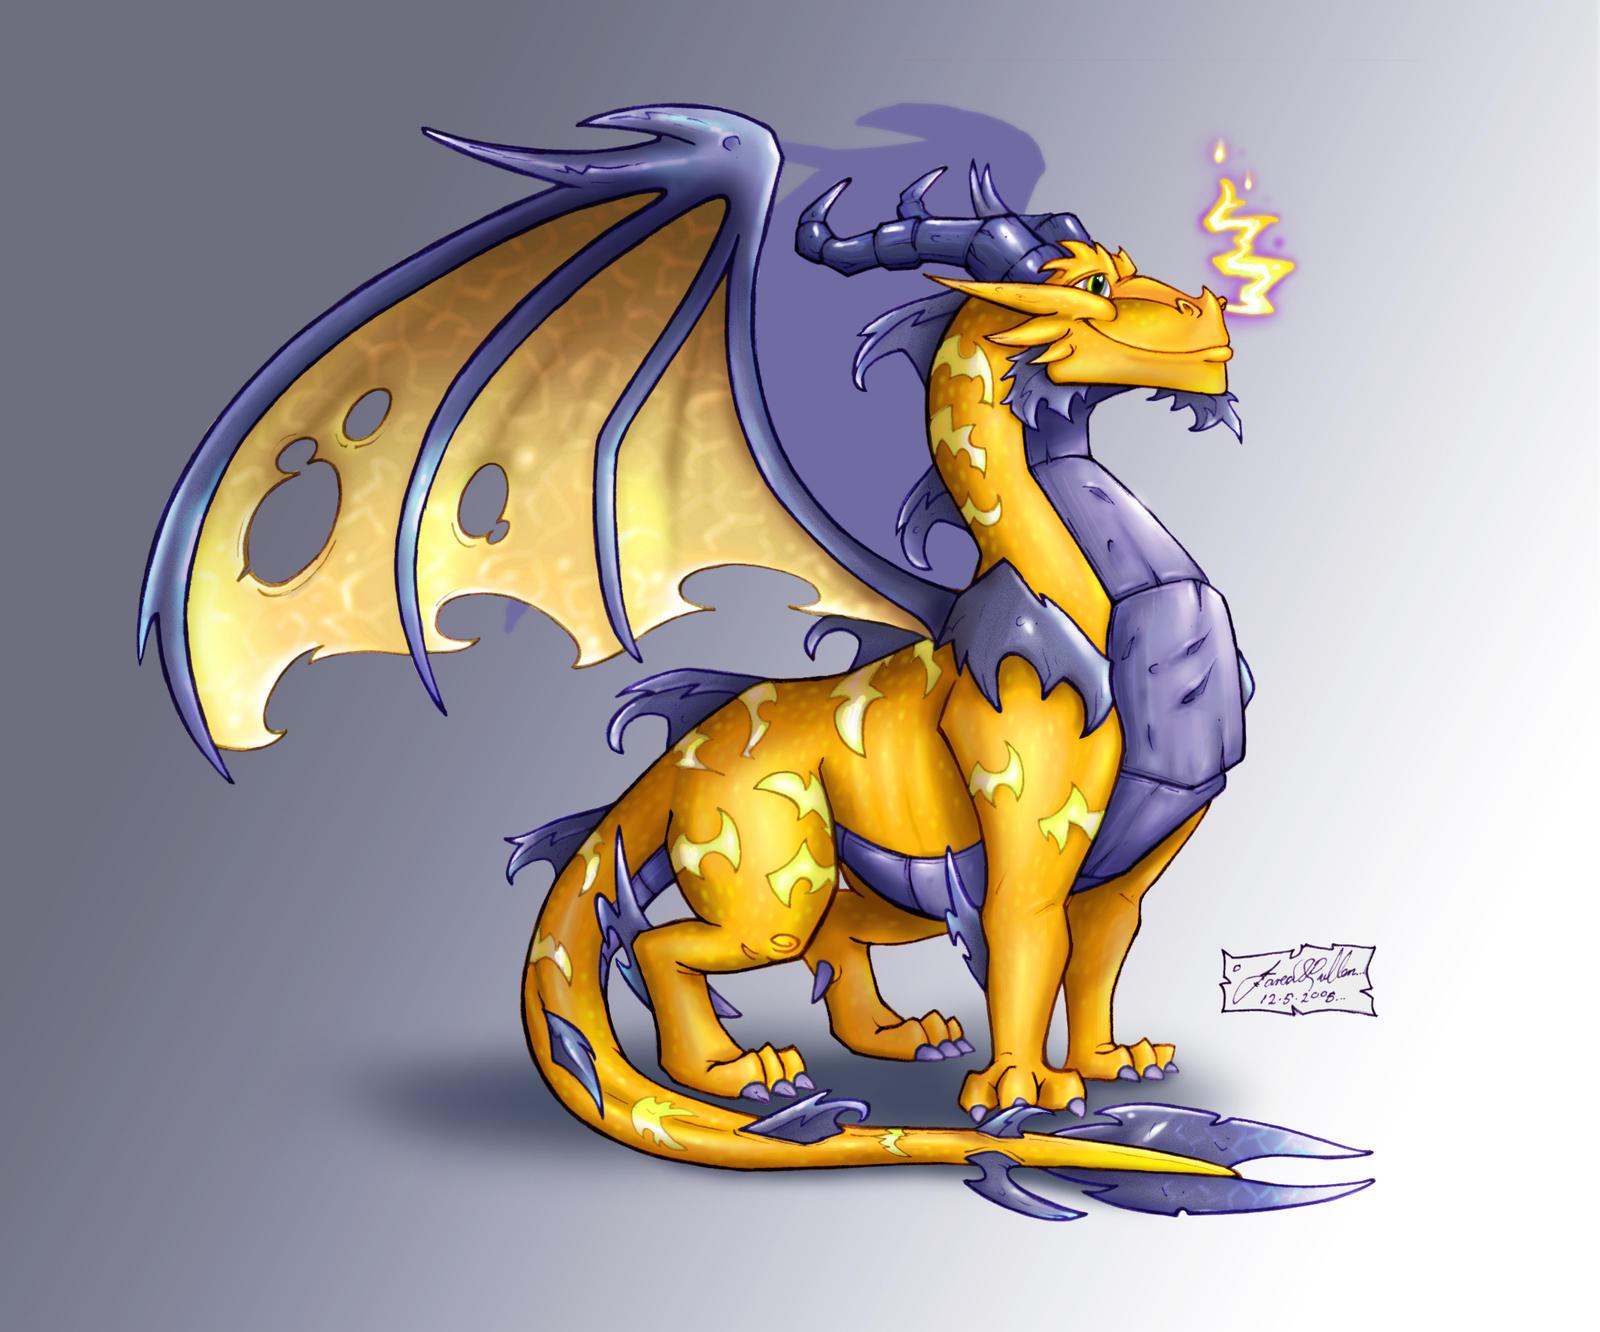 TLoS DragonGuardian Volteer